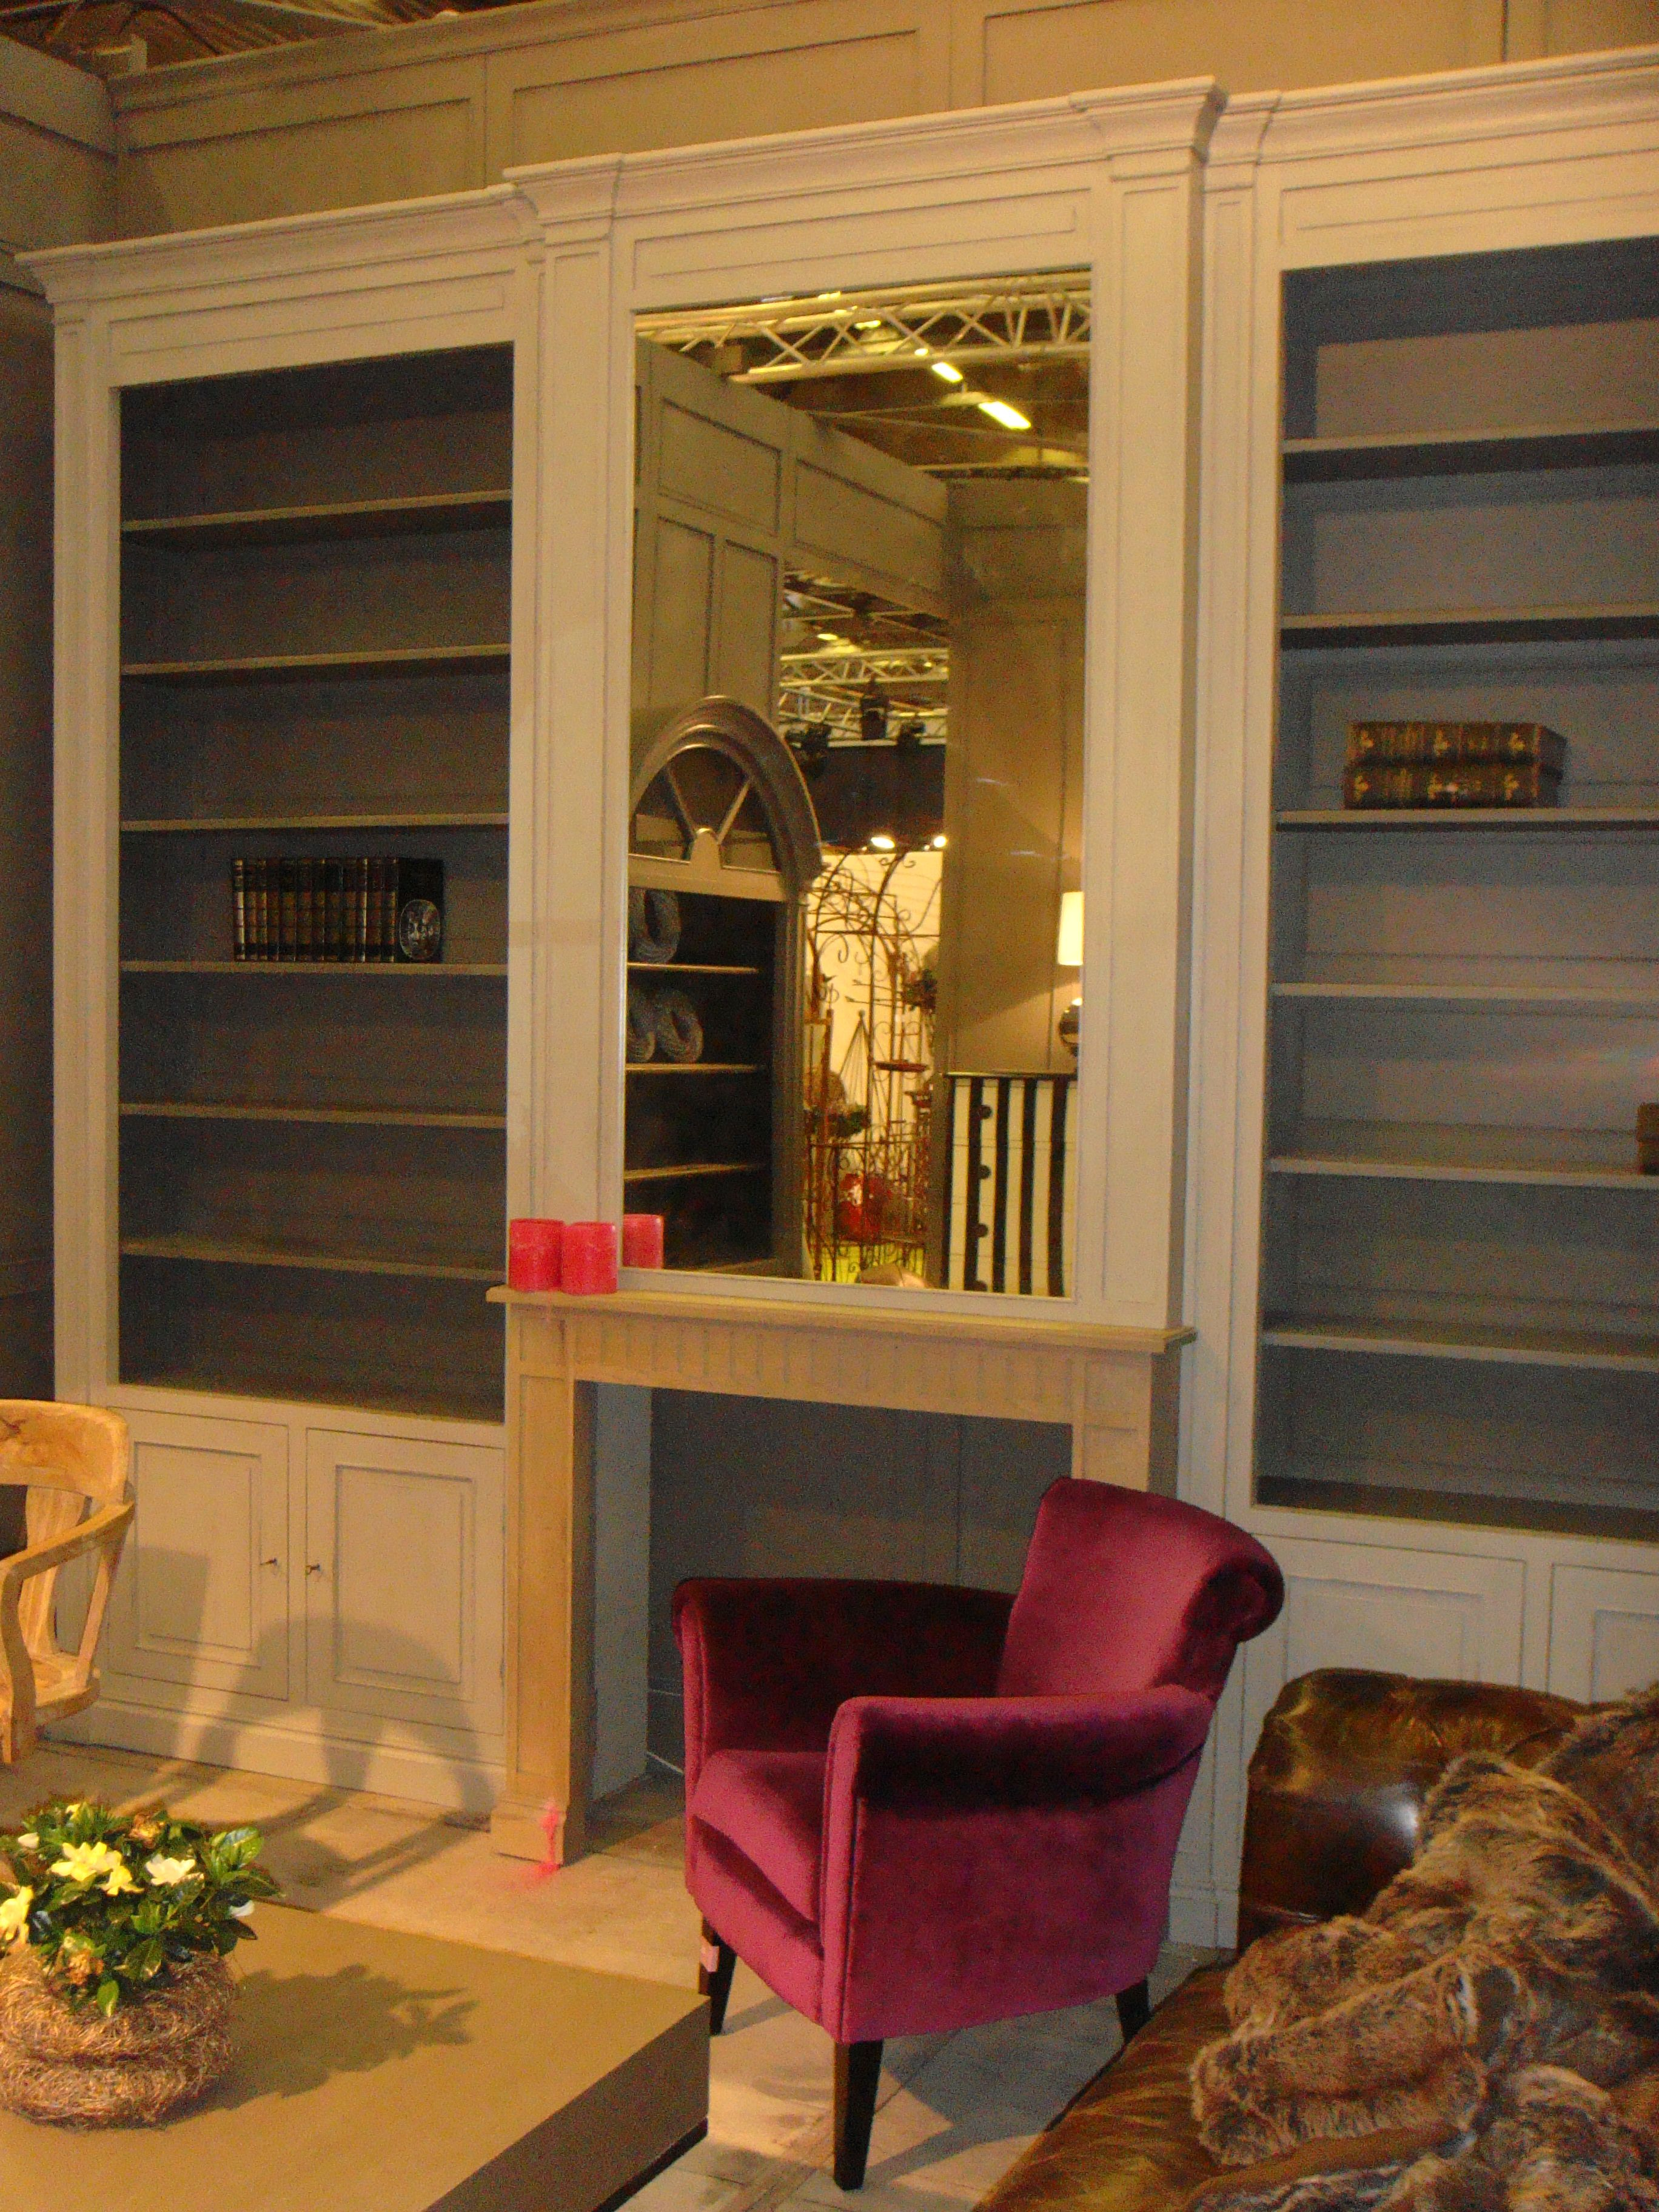 Inspirant agencement de meubles salon coin chemin e sjd8 for Agencement meuble salon